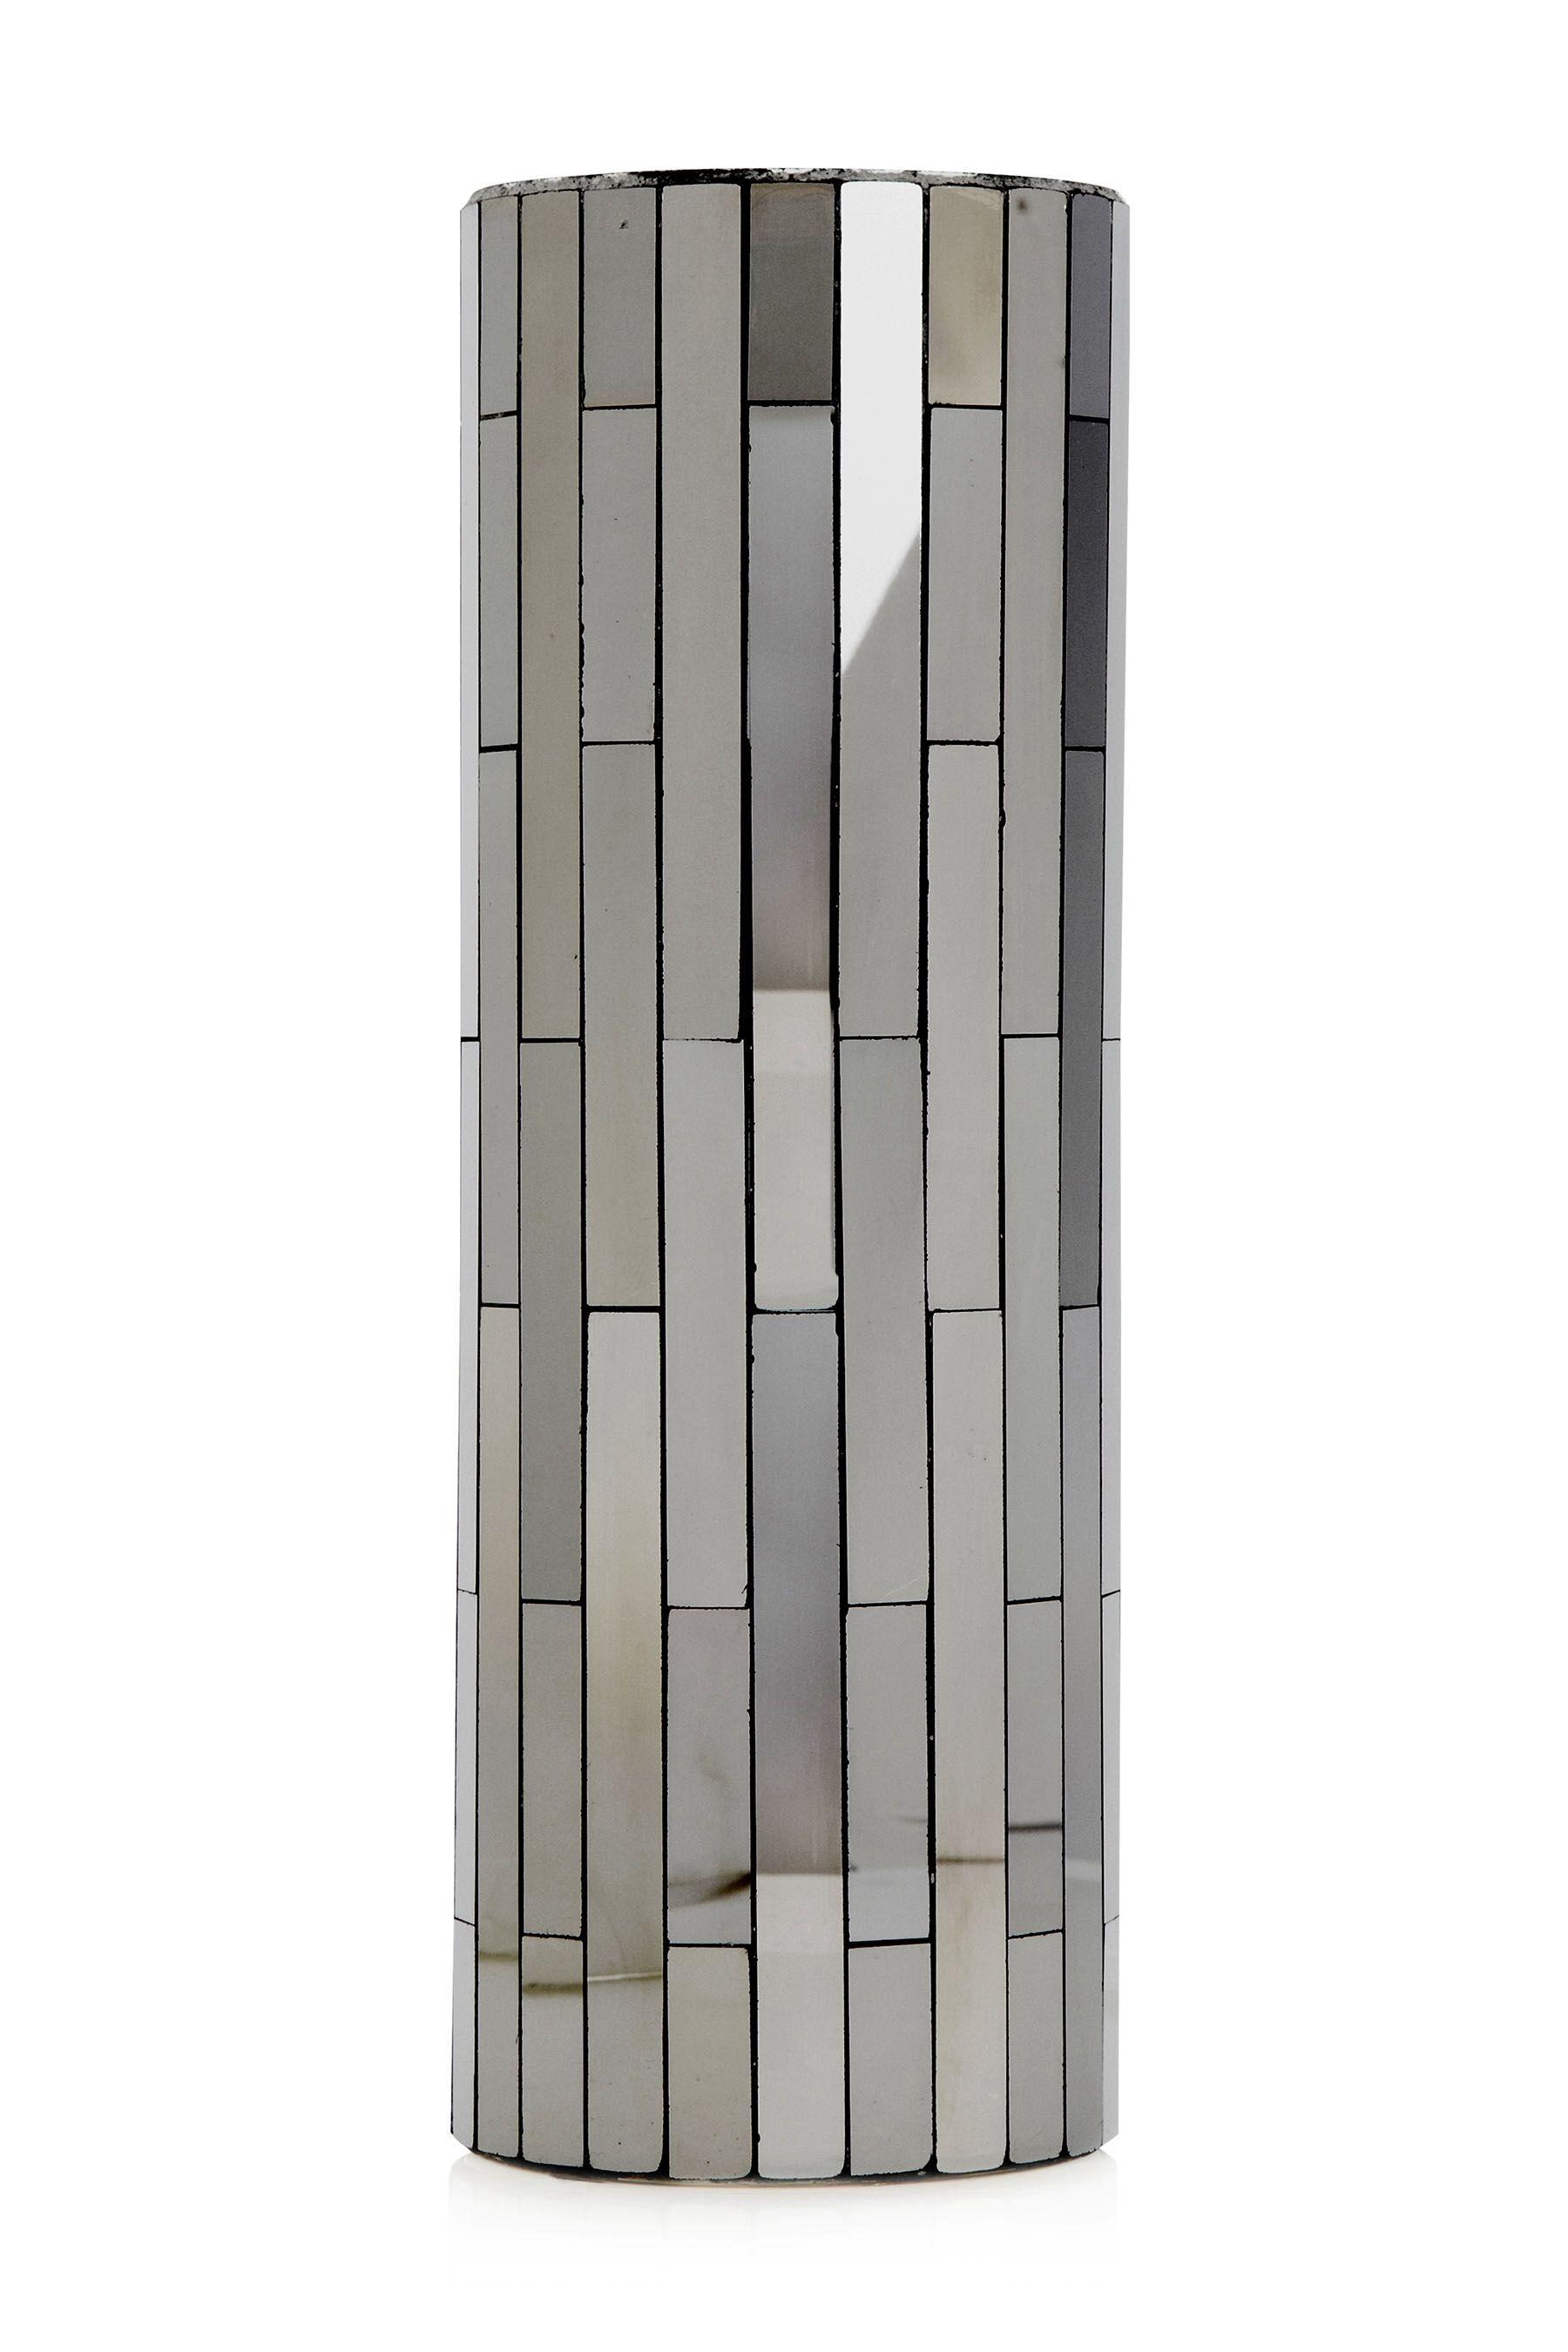 Mirror Mosaic Vase Next 24 Buy Mirror Mirror Mosaic